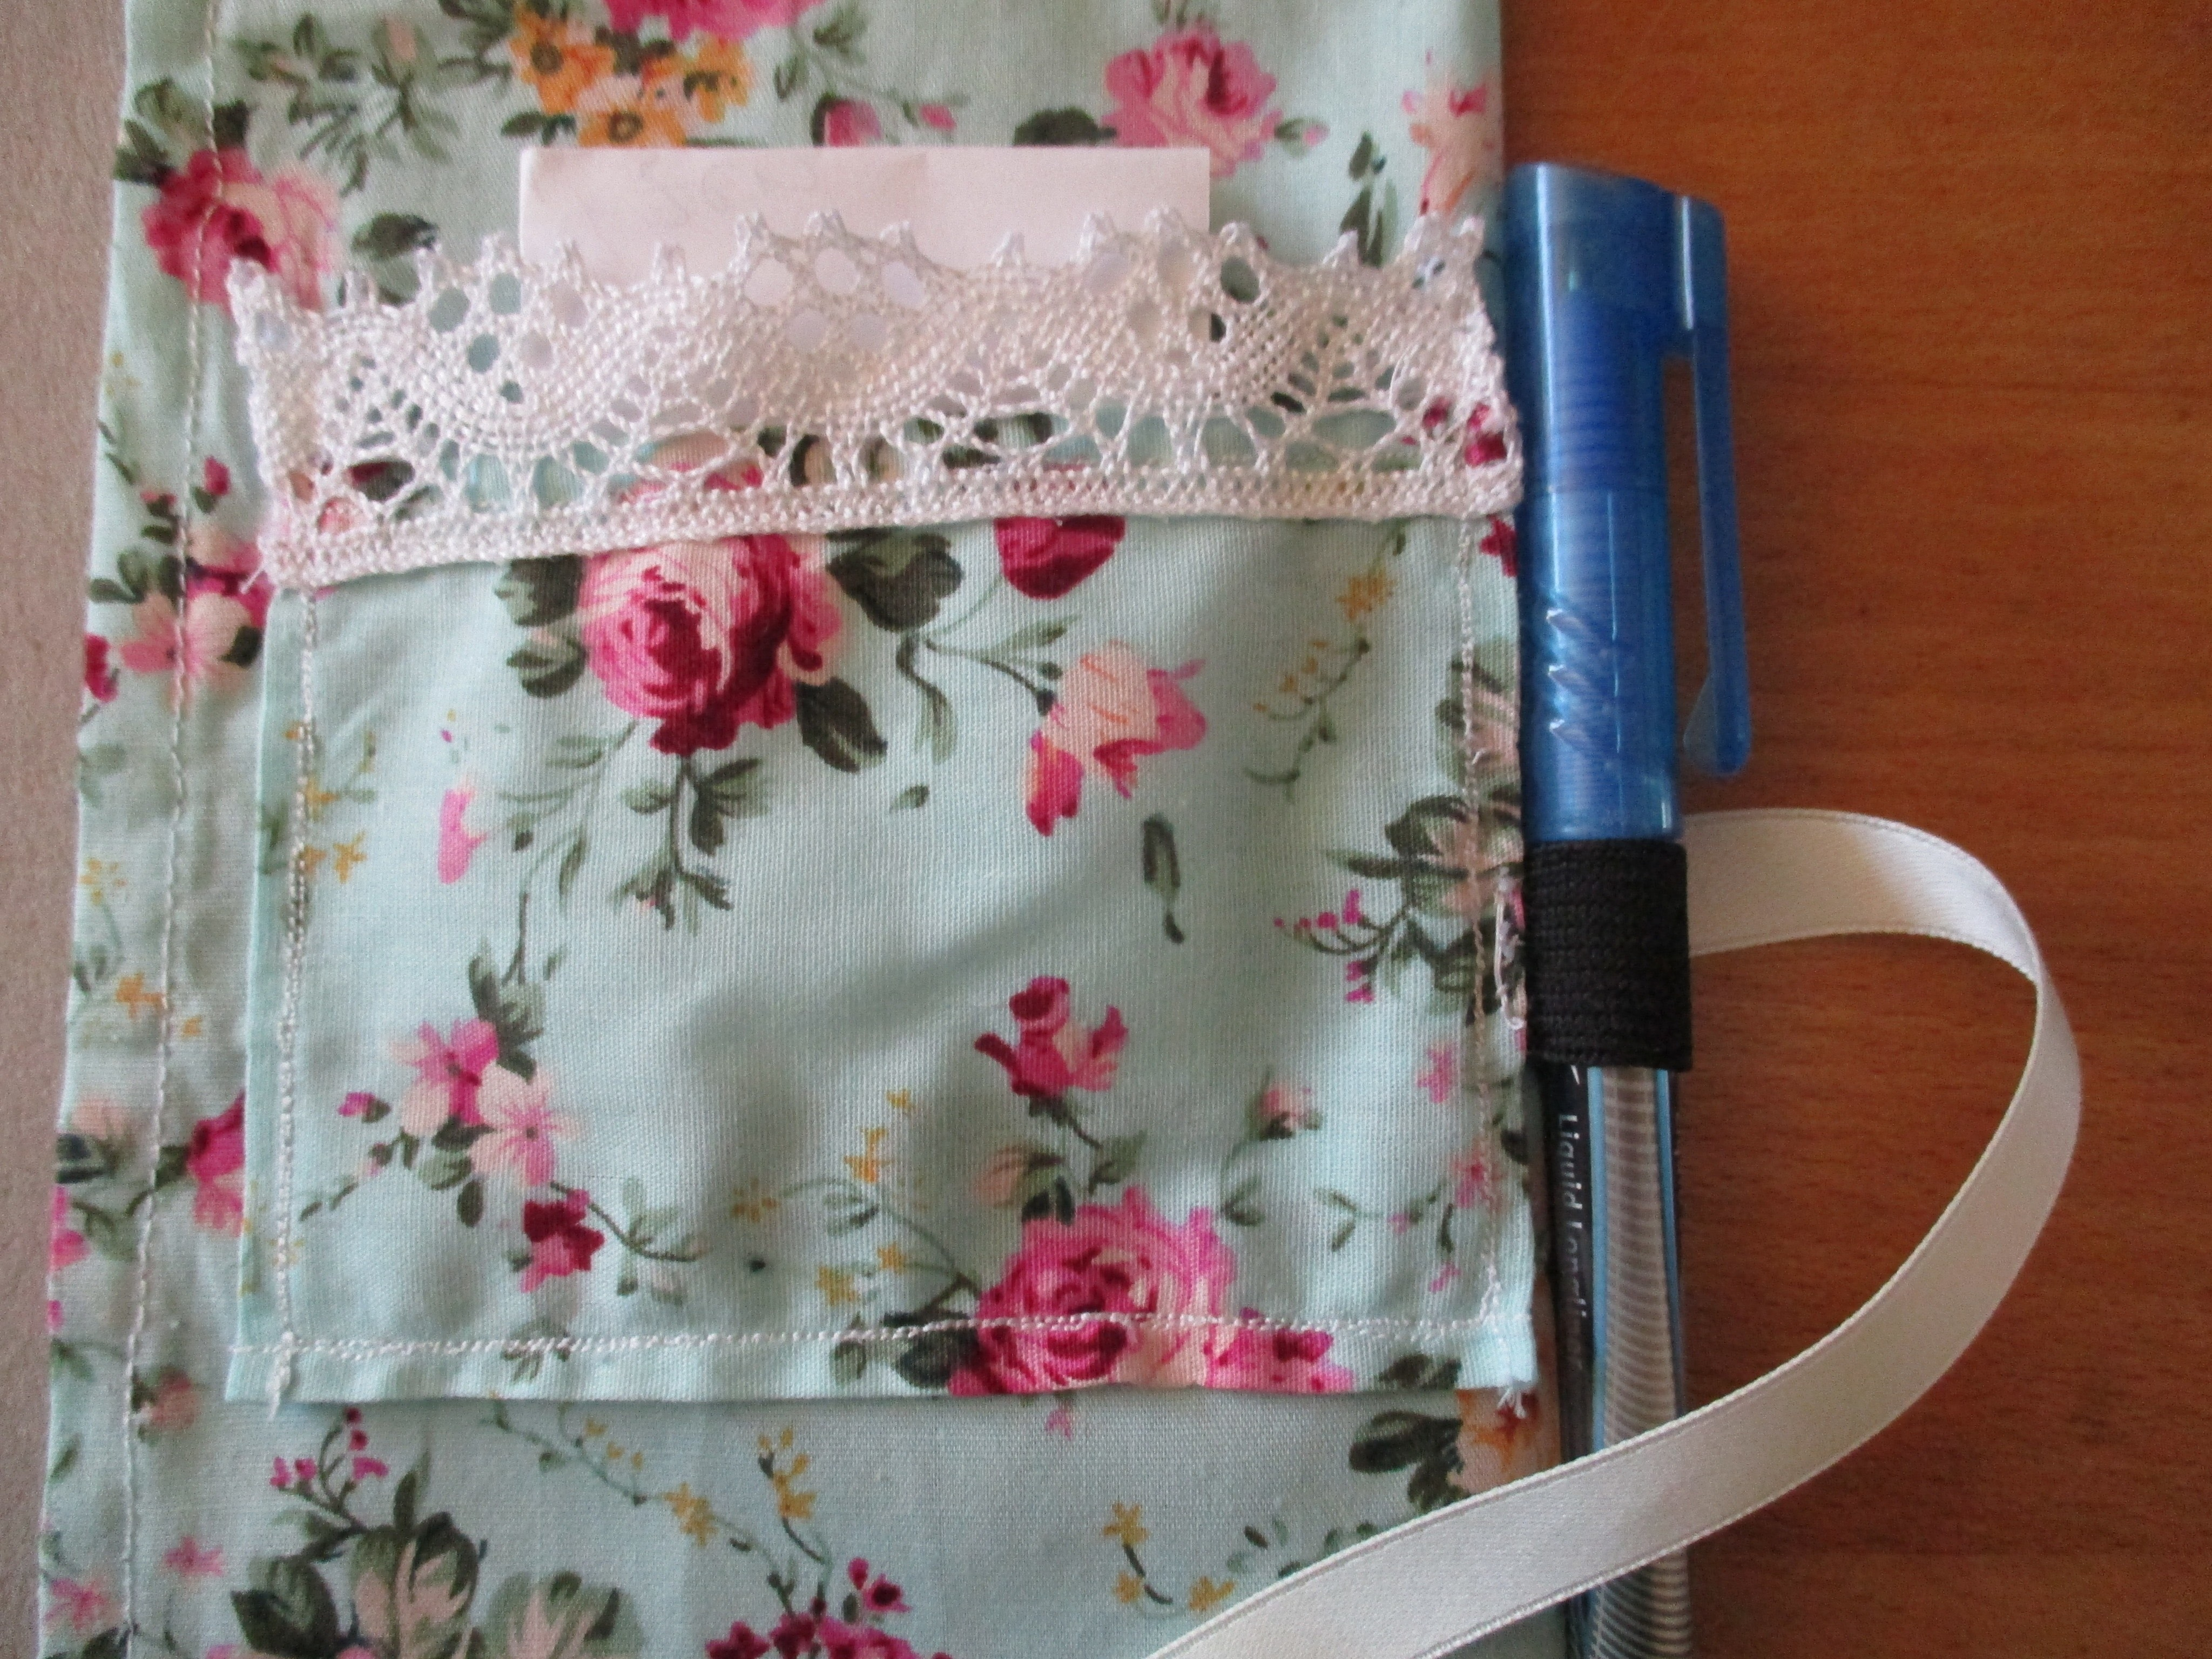 fabric folder  u00b7 how to make a fabric book cover  u00b7 sewing